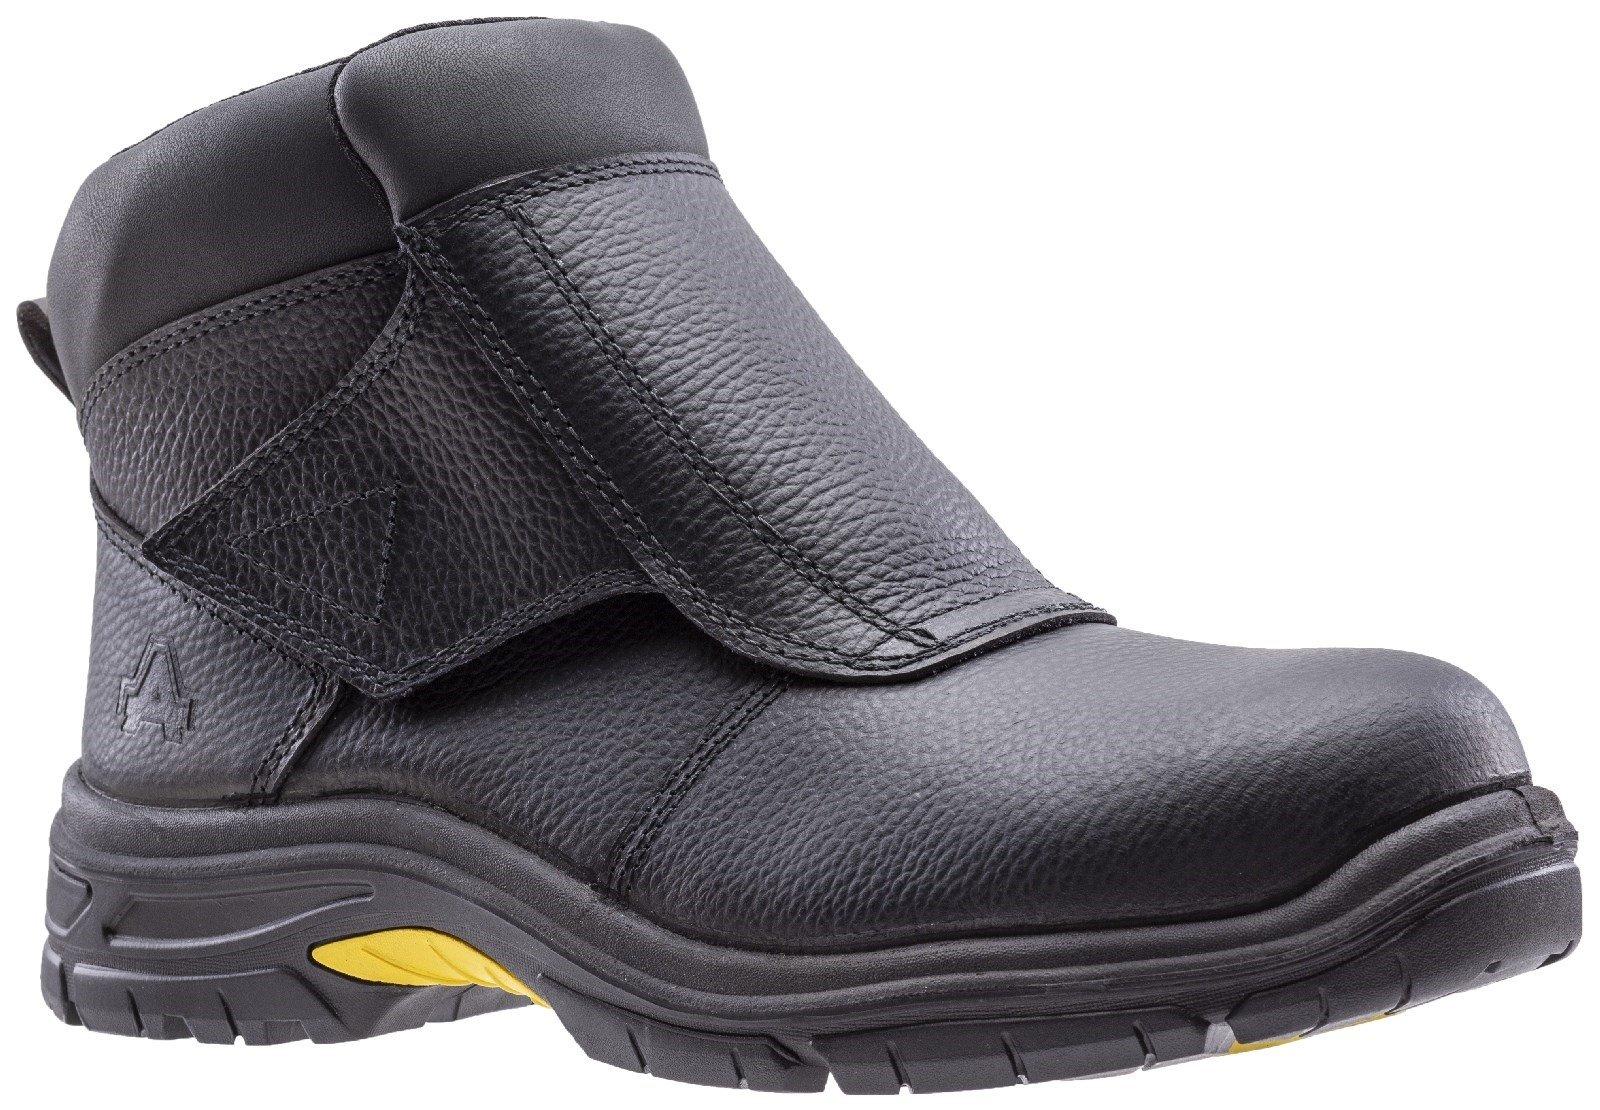 Amblers Unisex Safety Welding Boot Black 29417 - Black 6